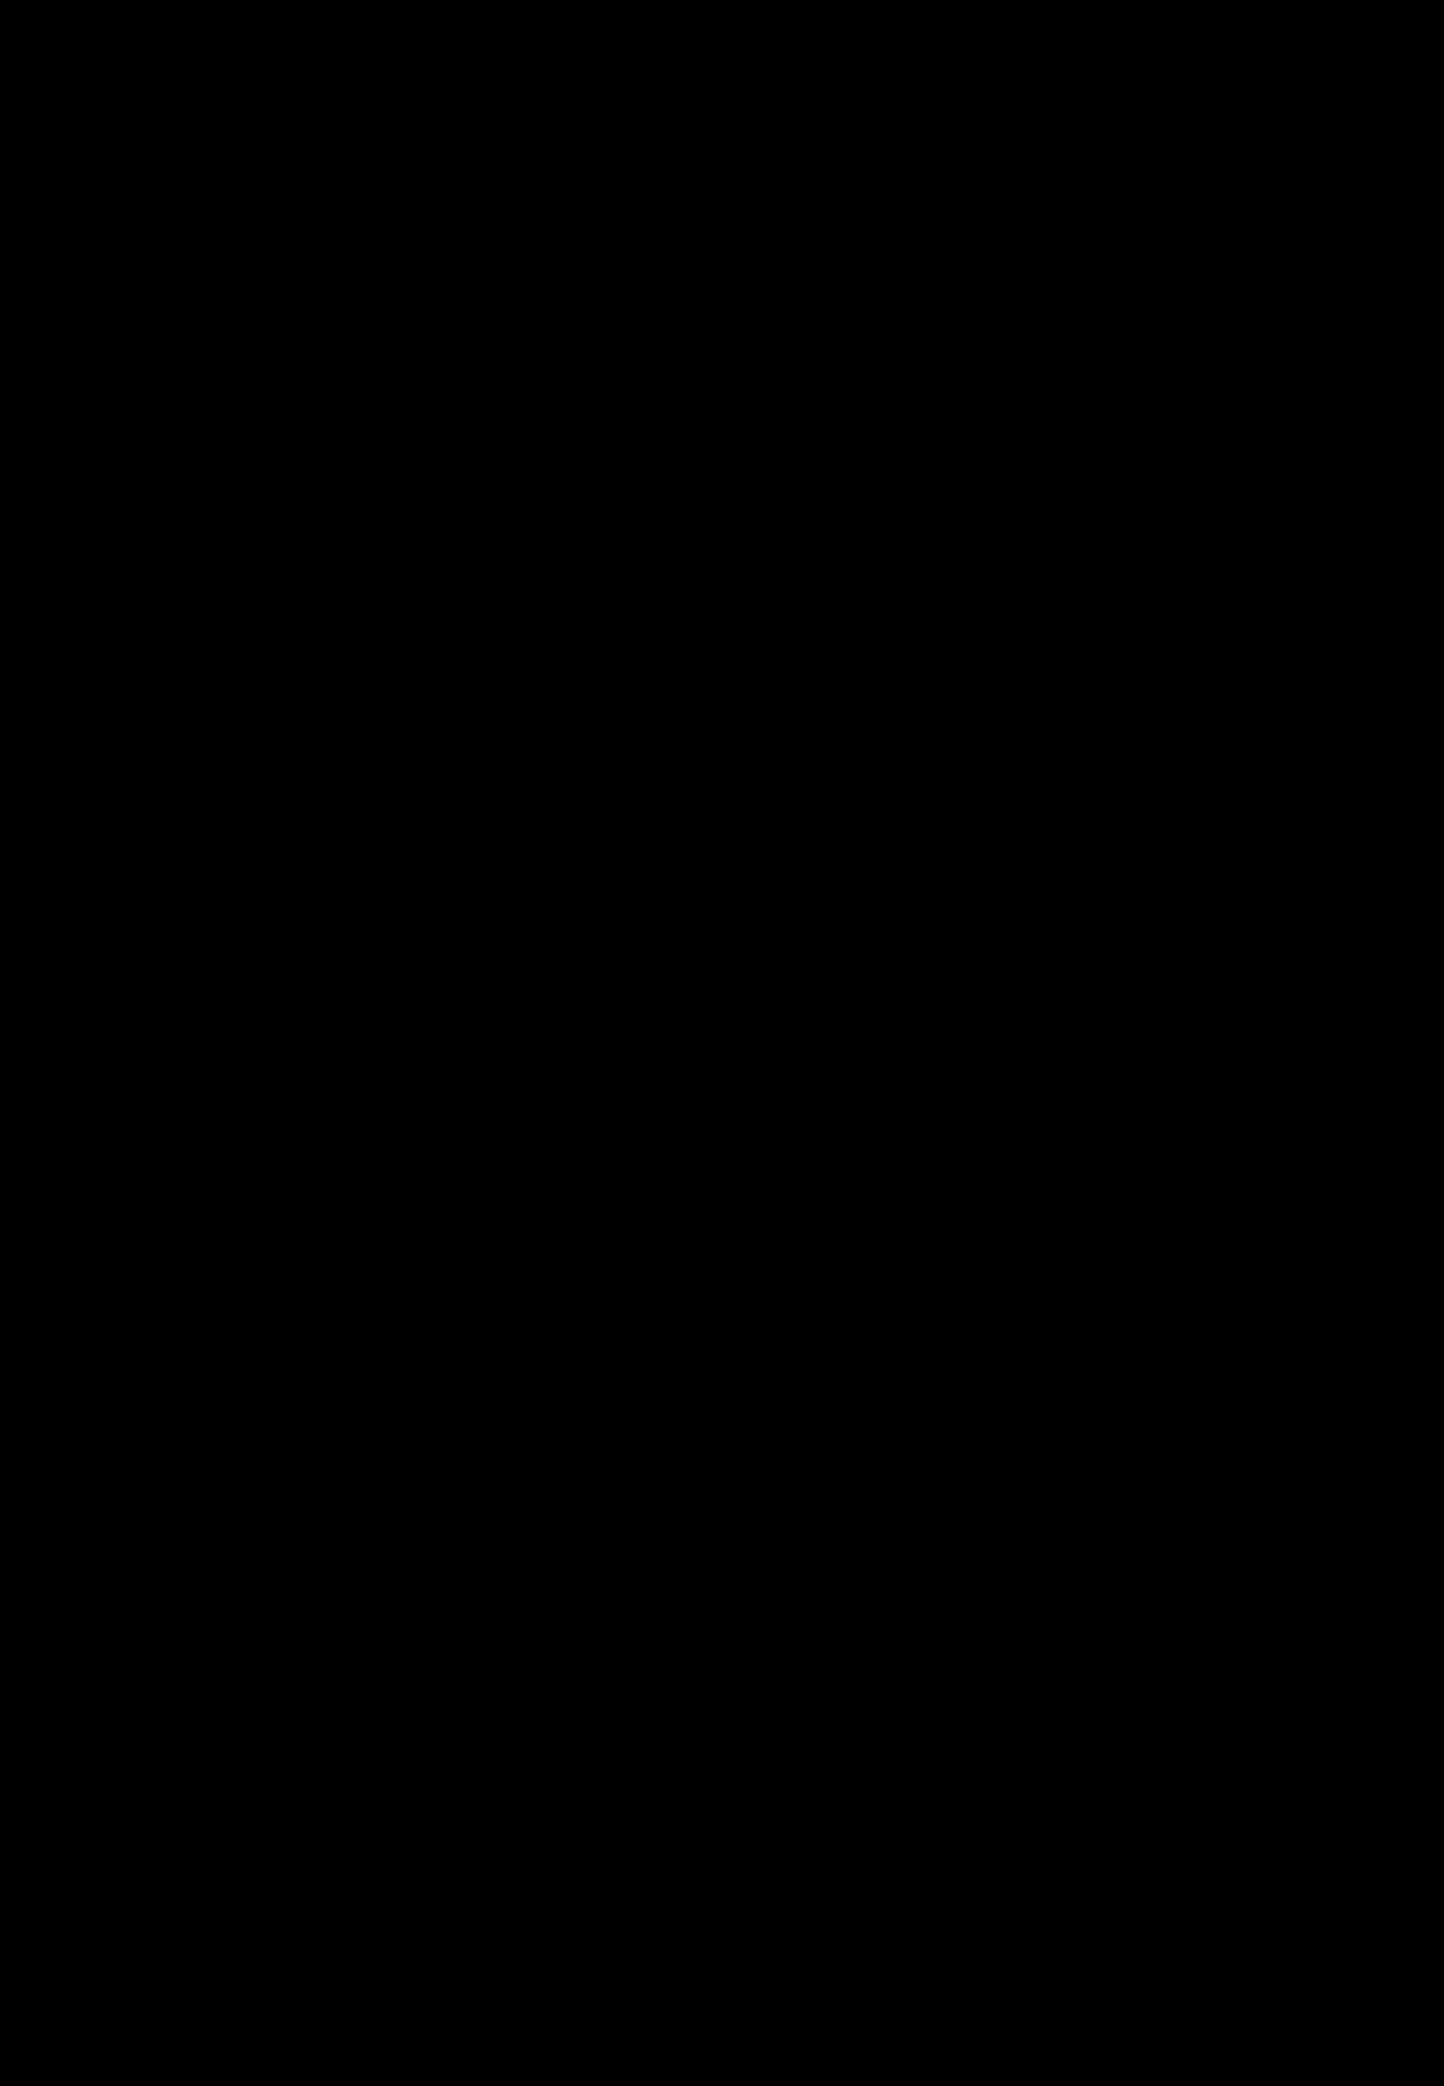 clipart sugar skull silhouette by karen arnold